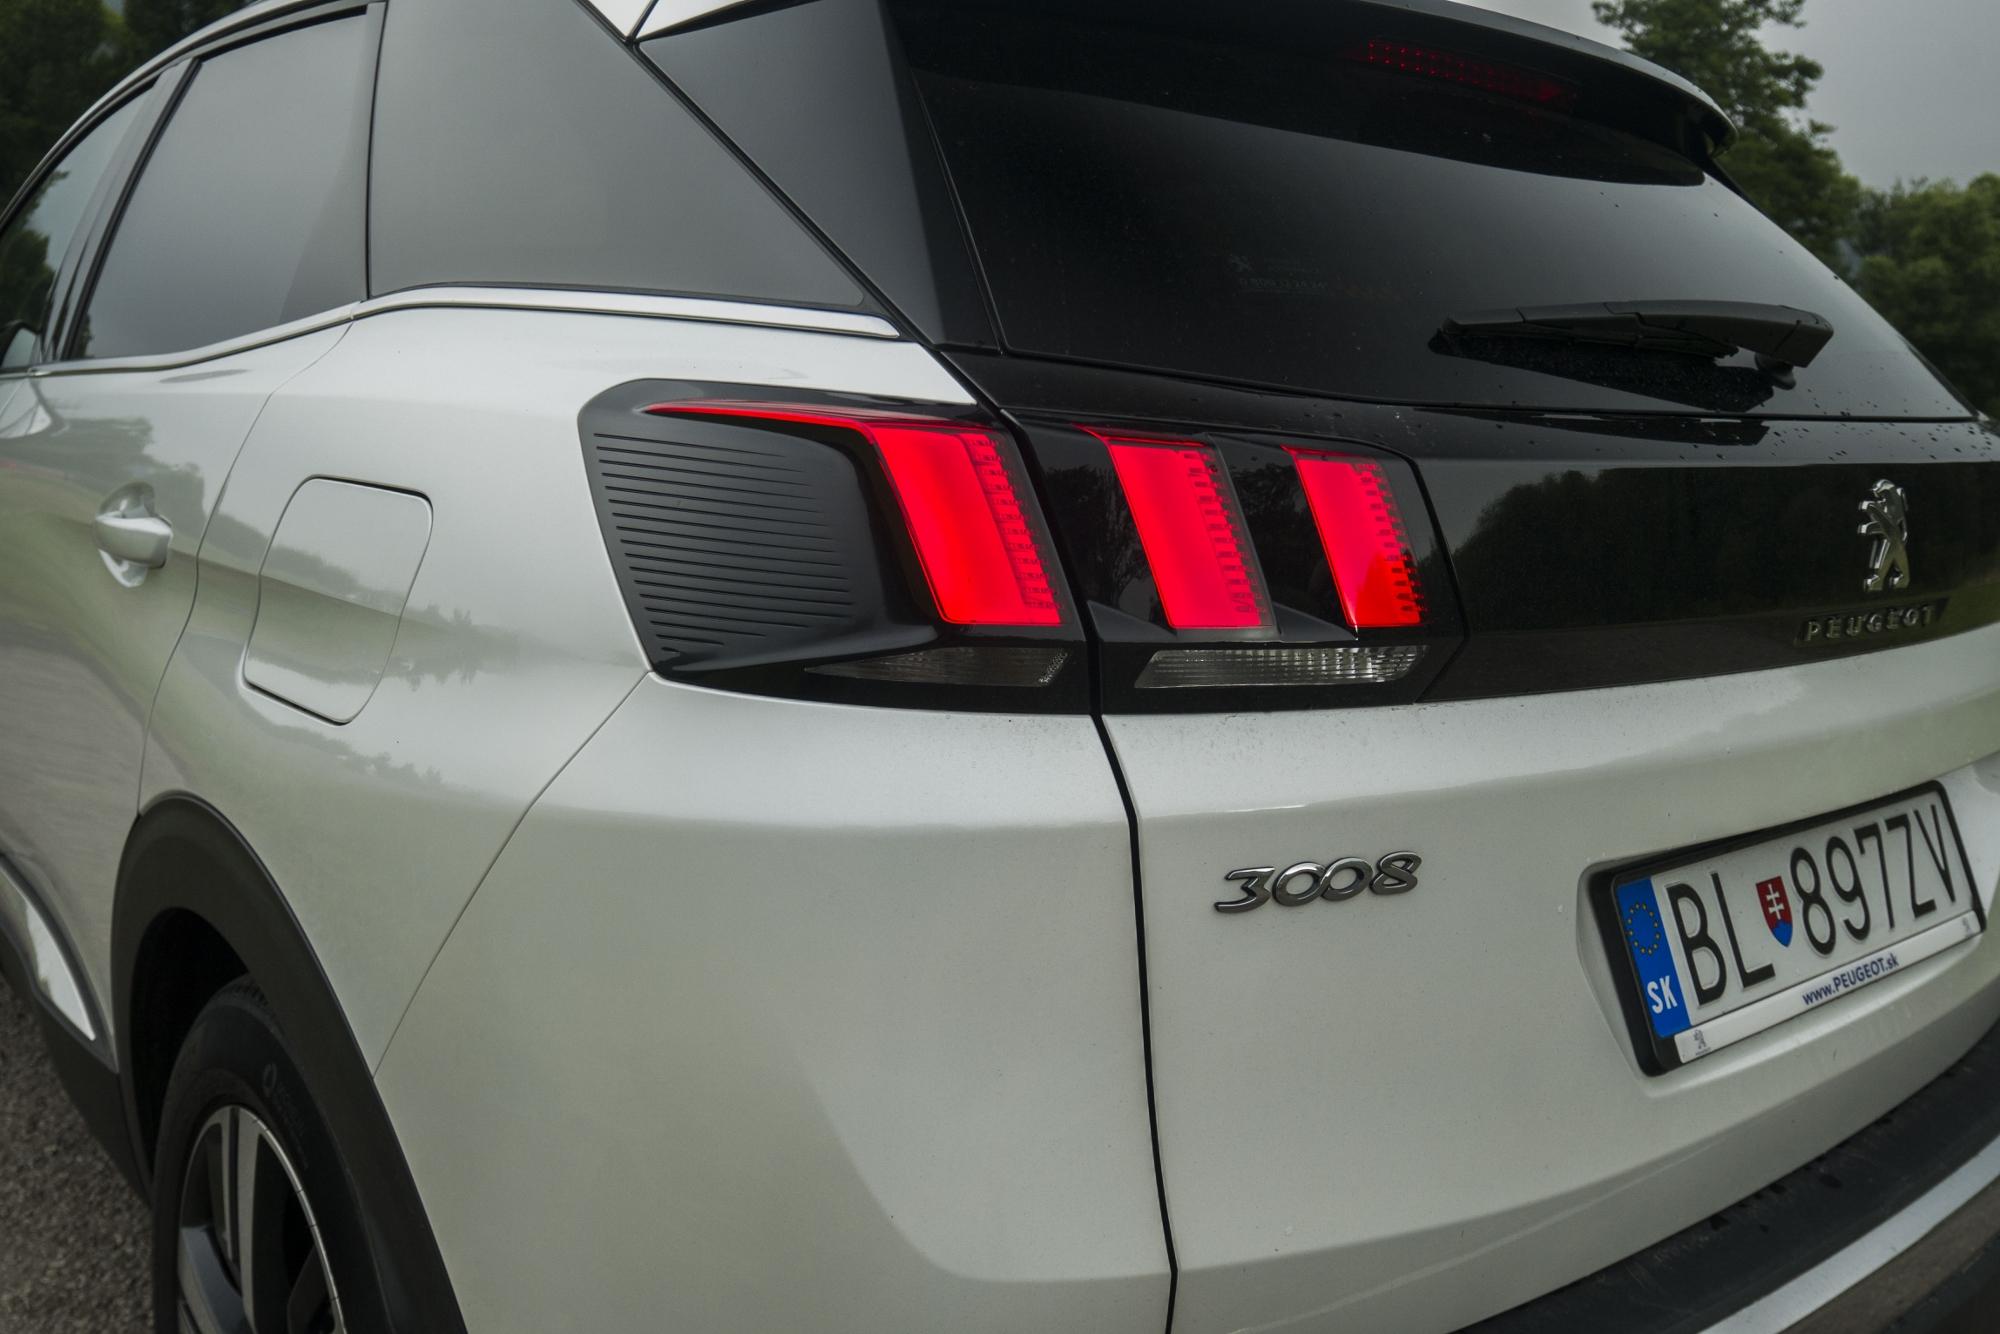 Test: Peugeot 3008 posúva schopnosti plug in hybridov OhGzrZh9Od peugeot-3008-hybrid4-10